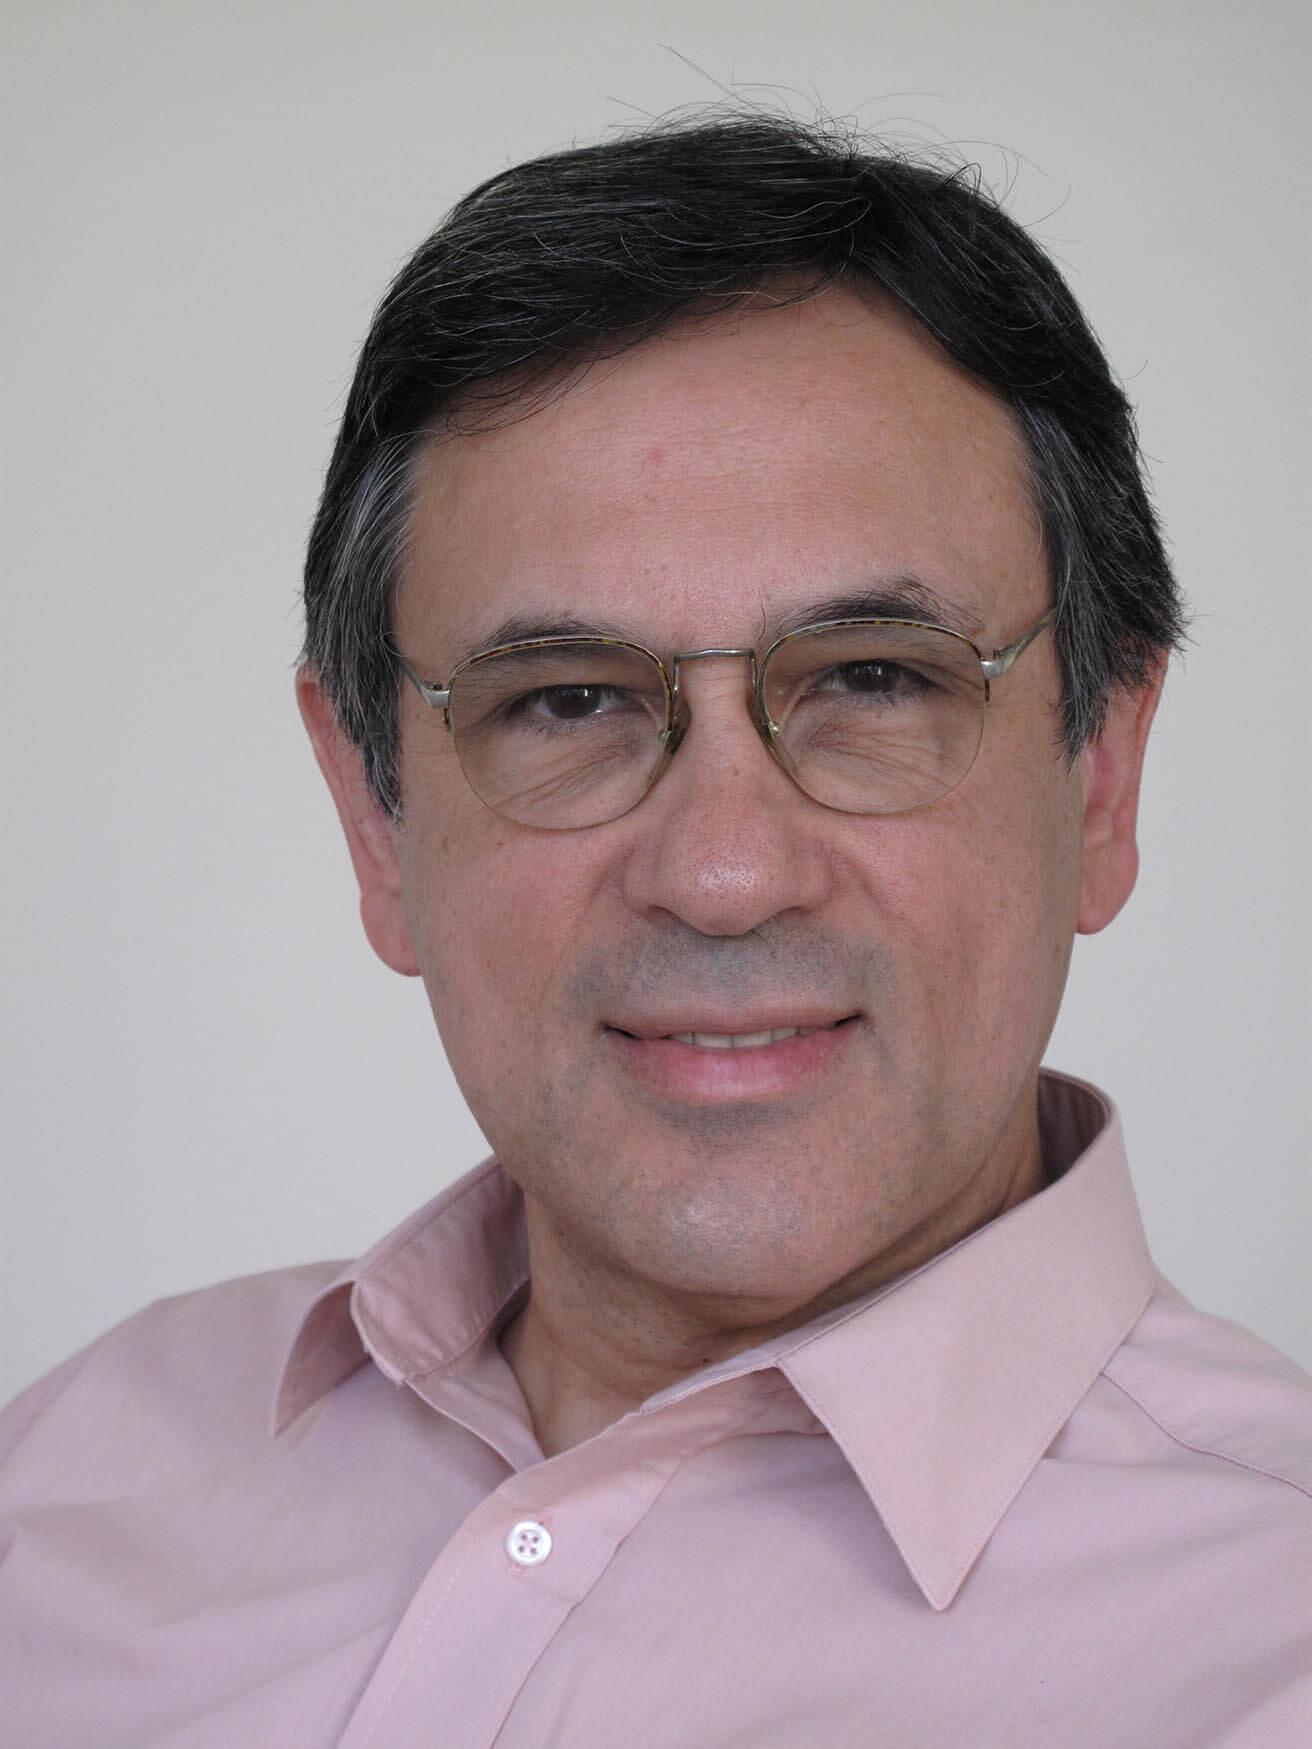 RAUL QUEIROZ FEITOSA